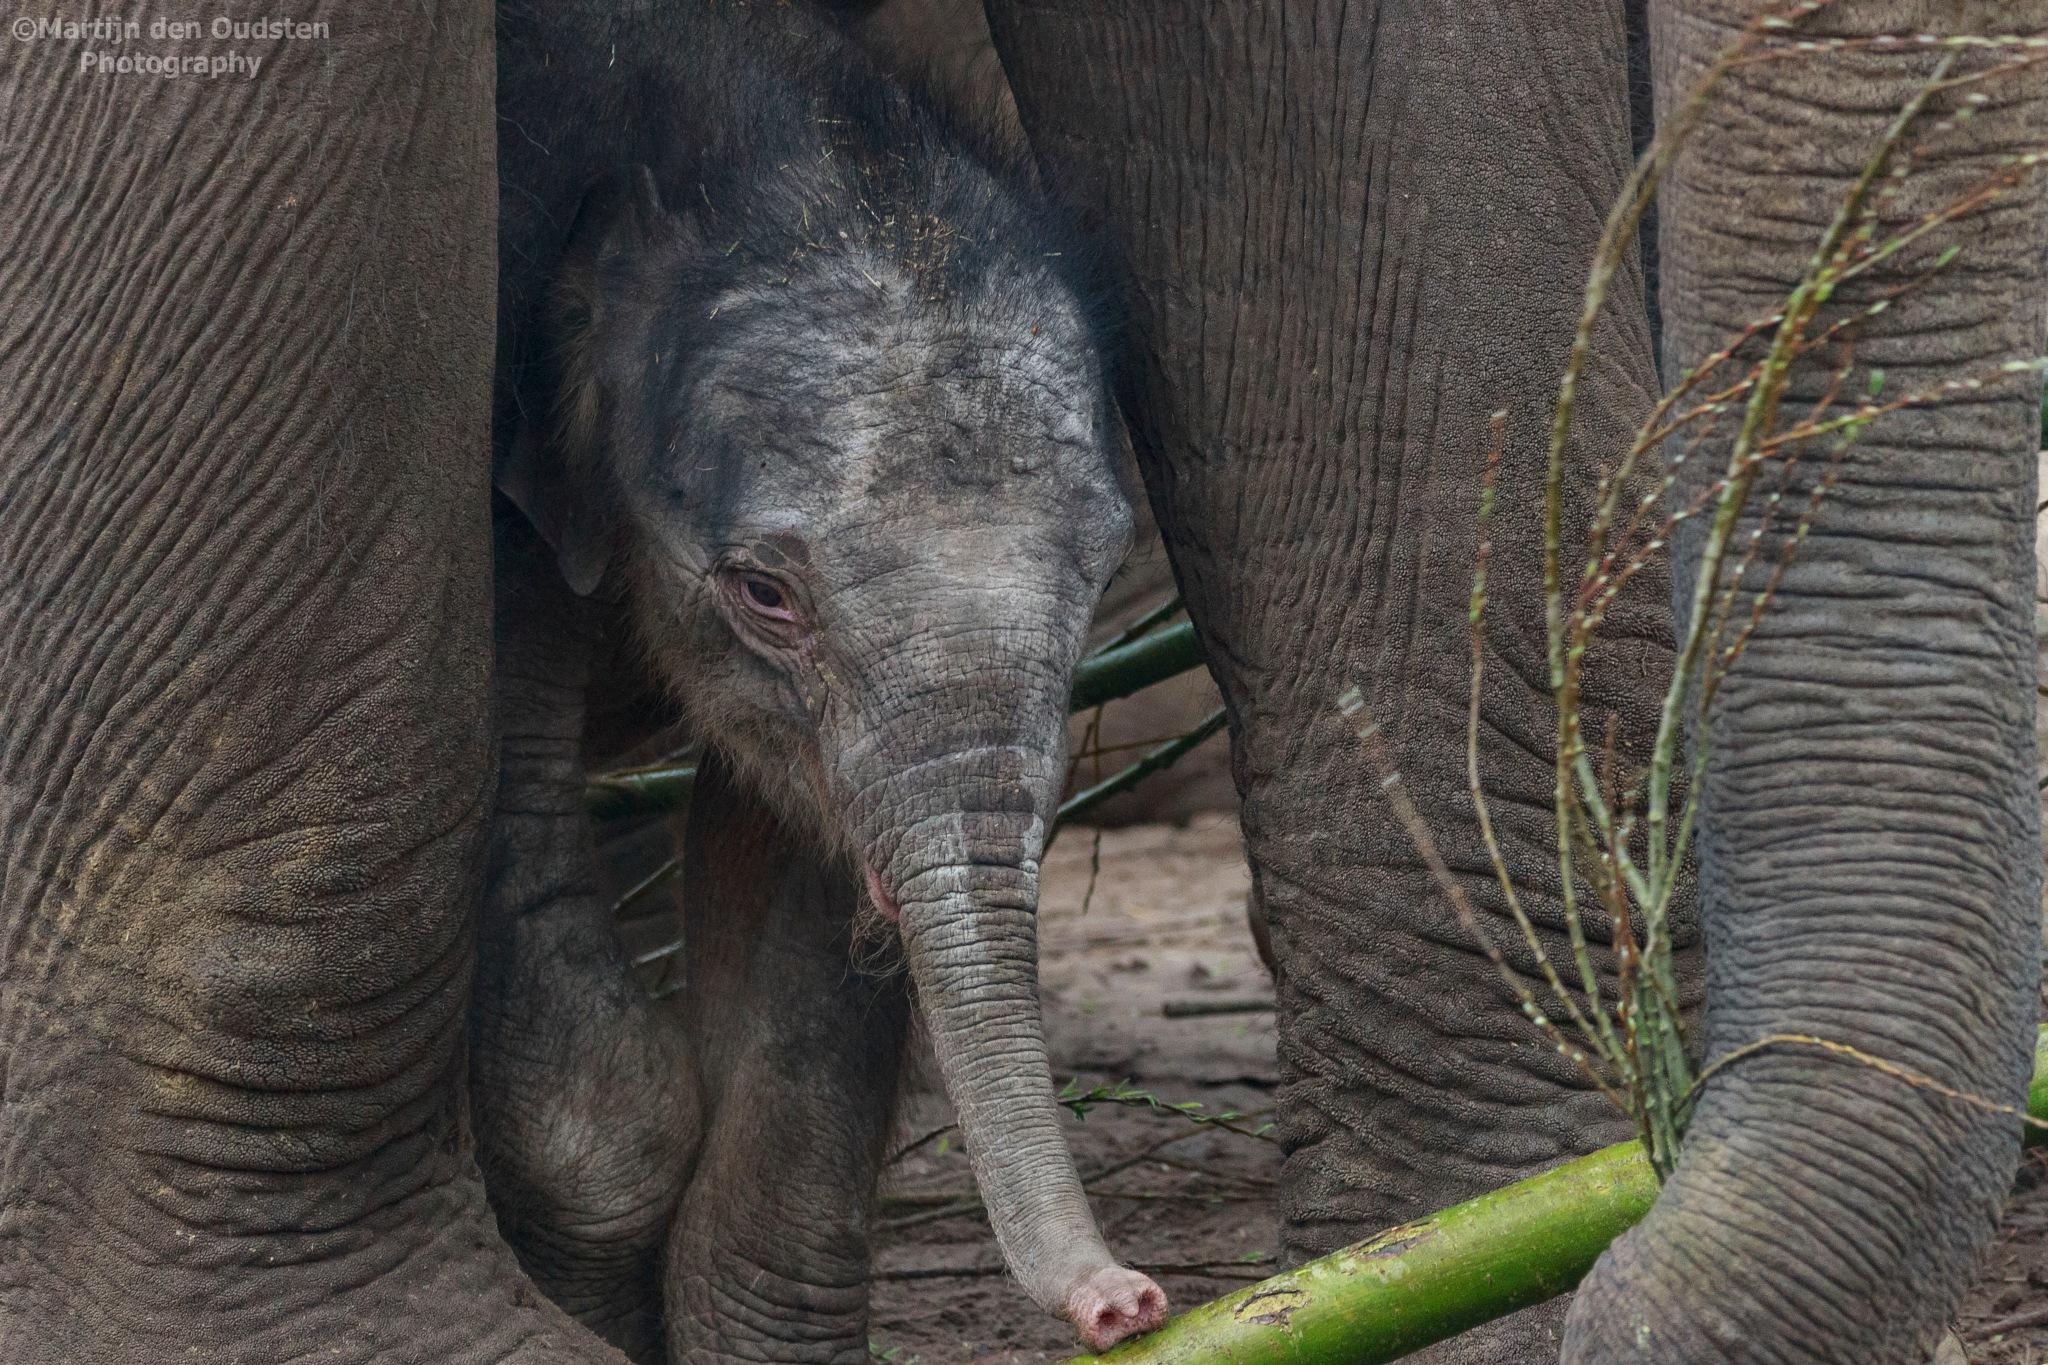 Elephant by Martijn Den Oudsten